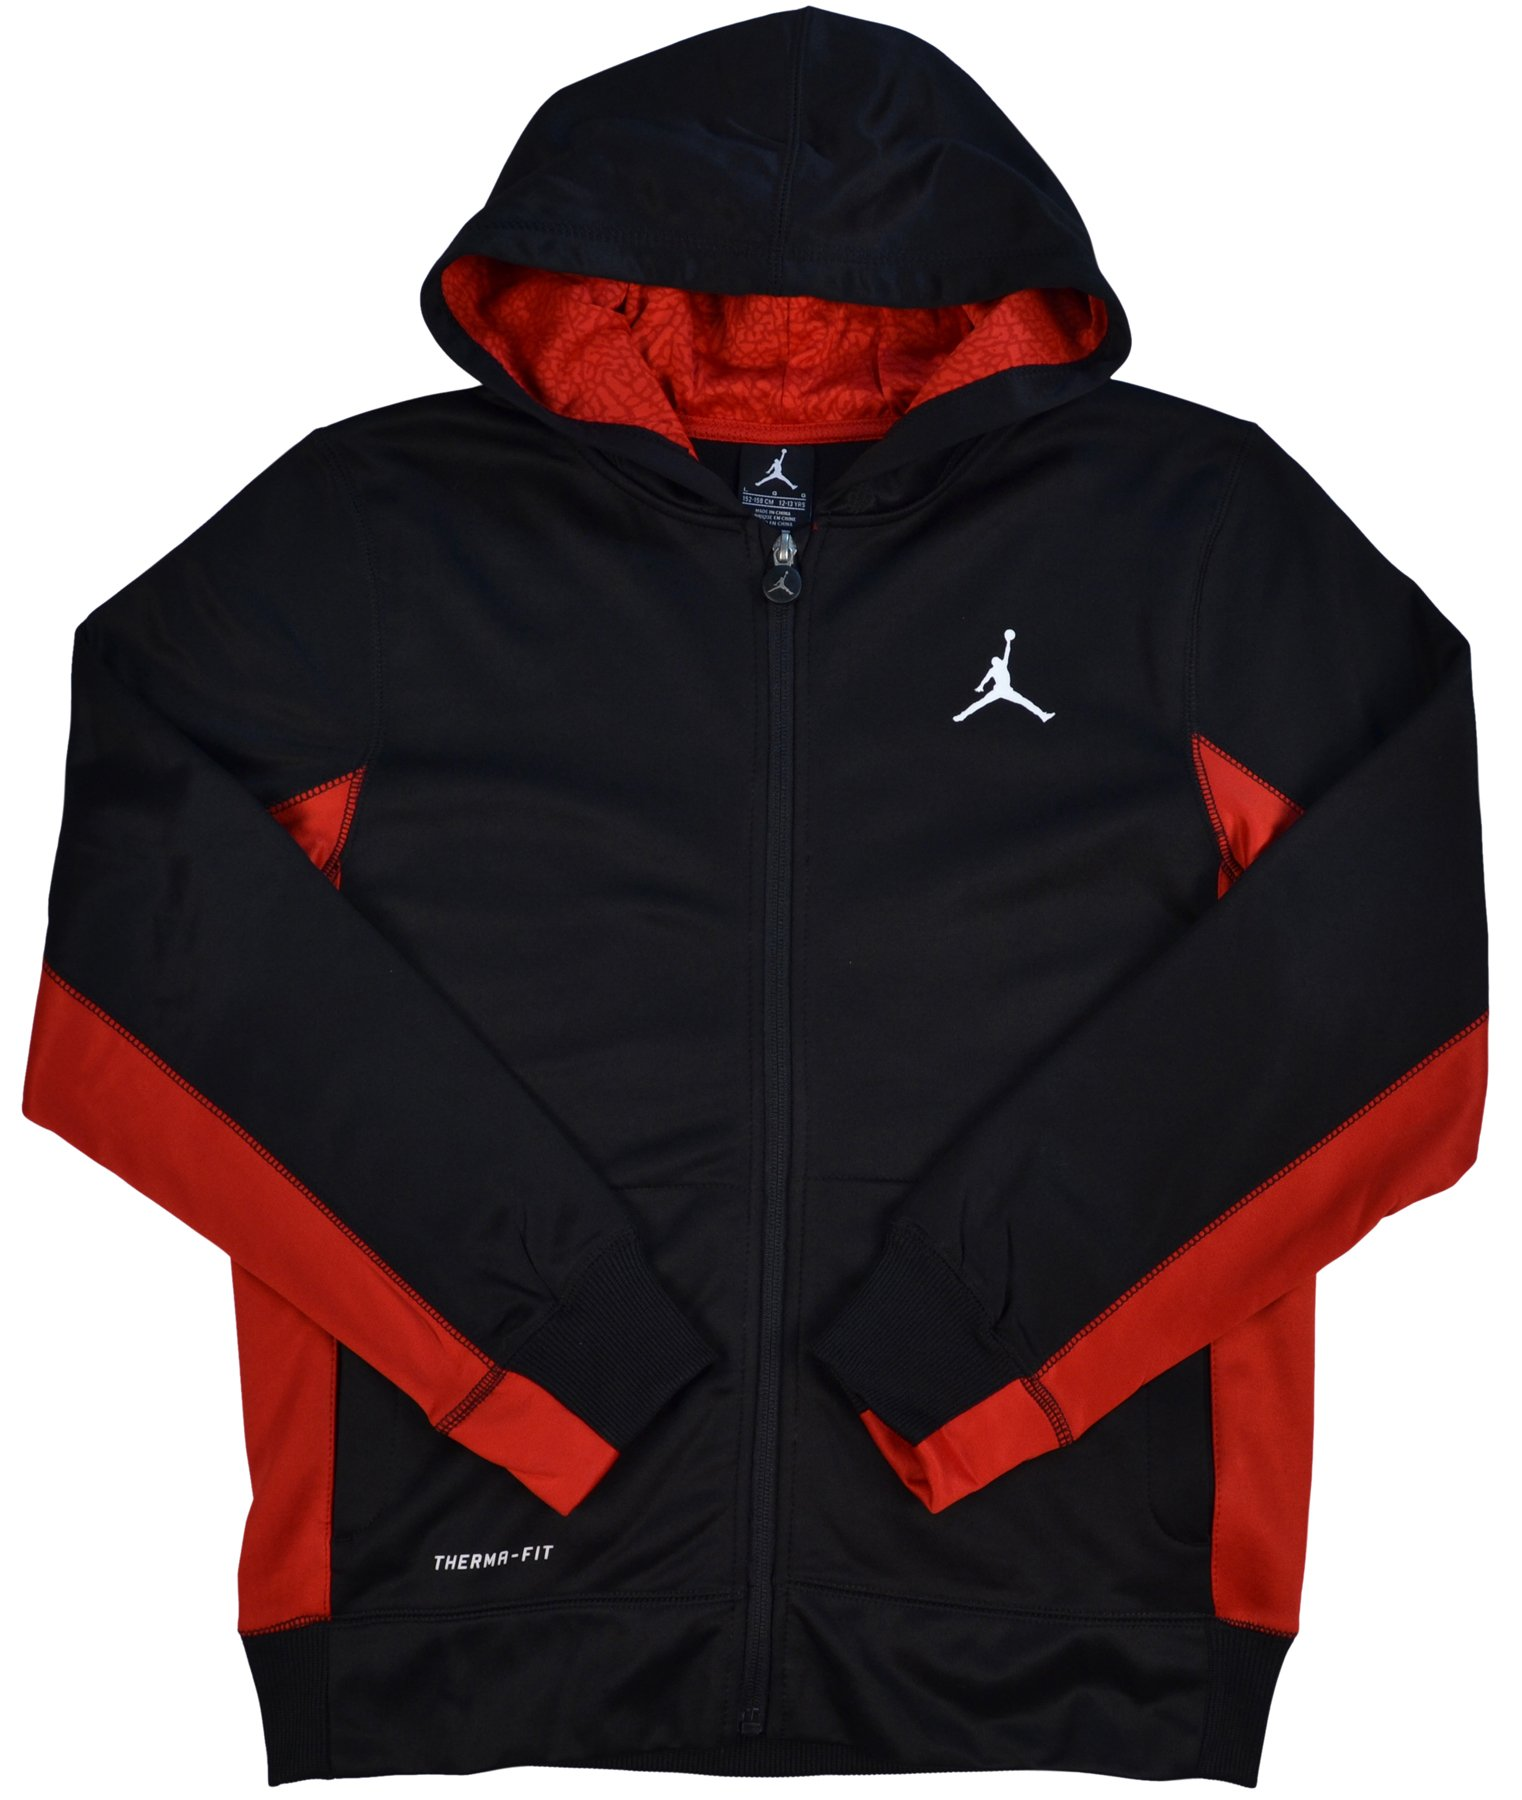 Nike Air Jordan Boys' Therma-Fit Jumpman Full Zip Hoodie (Black, X-Large)